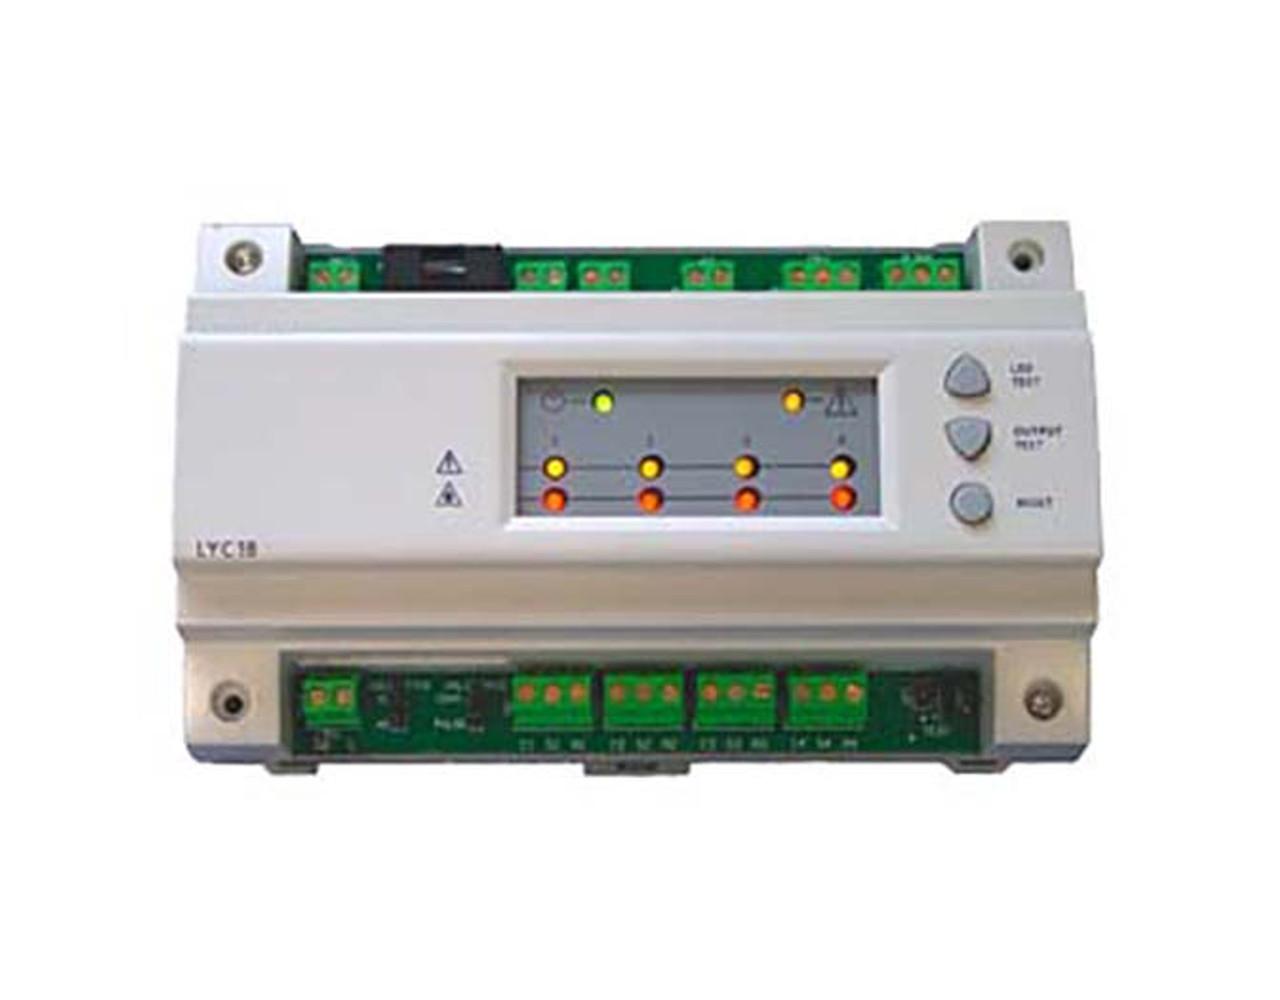 Sensigas UCE18, Replaces Siemens LYC18